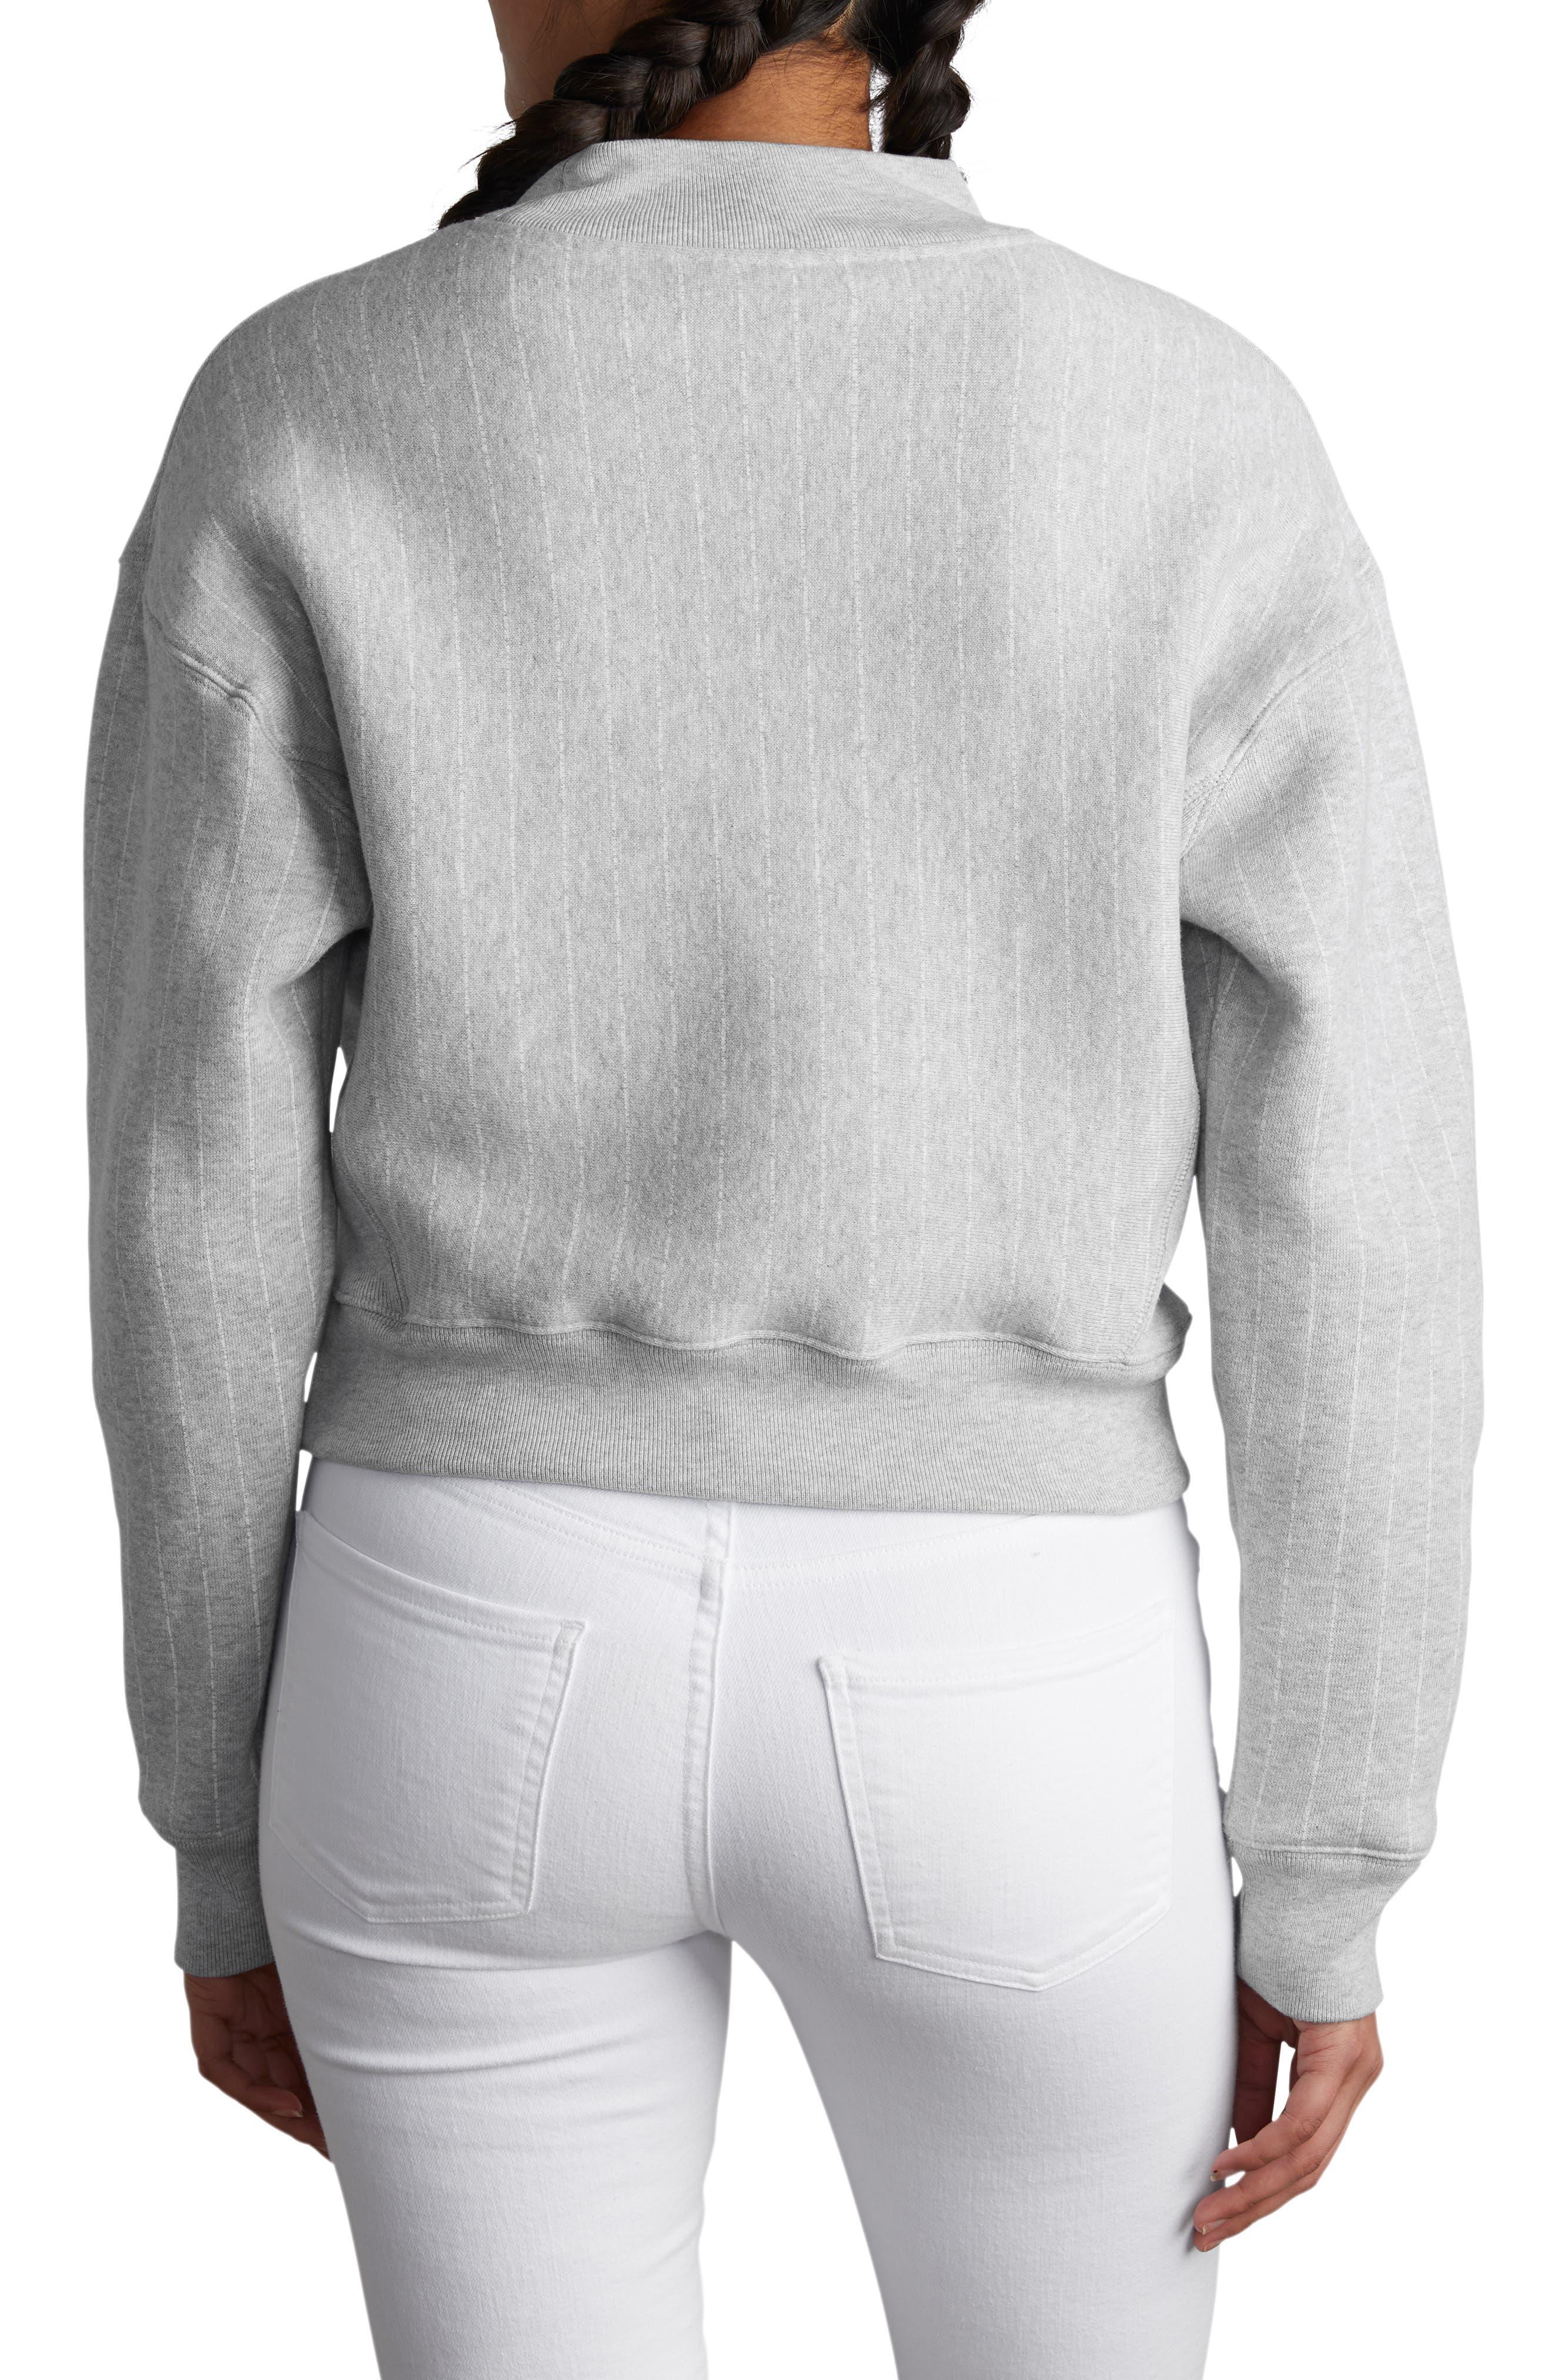 CHAMPION, Mock Neck Reverse Panel Crop Sweatshirt, Alternate thumbnail 2, color, PINSTRIPE OXFORD GREY